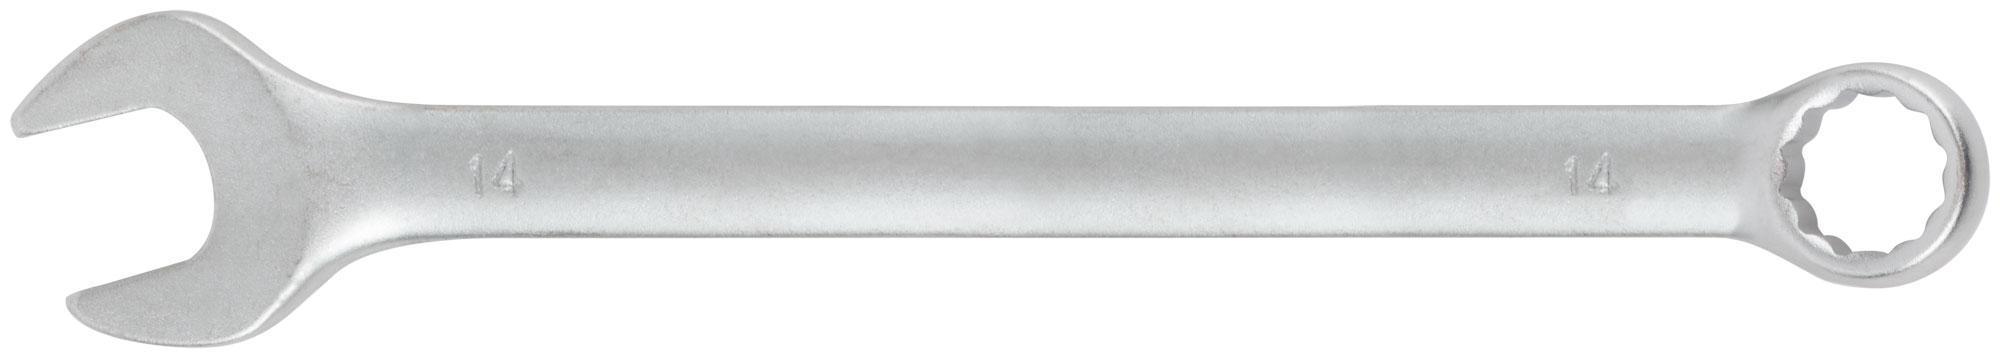 Ключ гаечный комбинированный Fit 63254 (14 мм) ключ комбинированный kraft 14 мм кт 700508